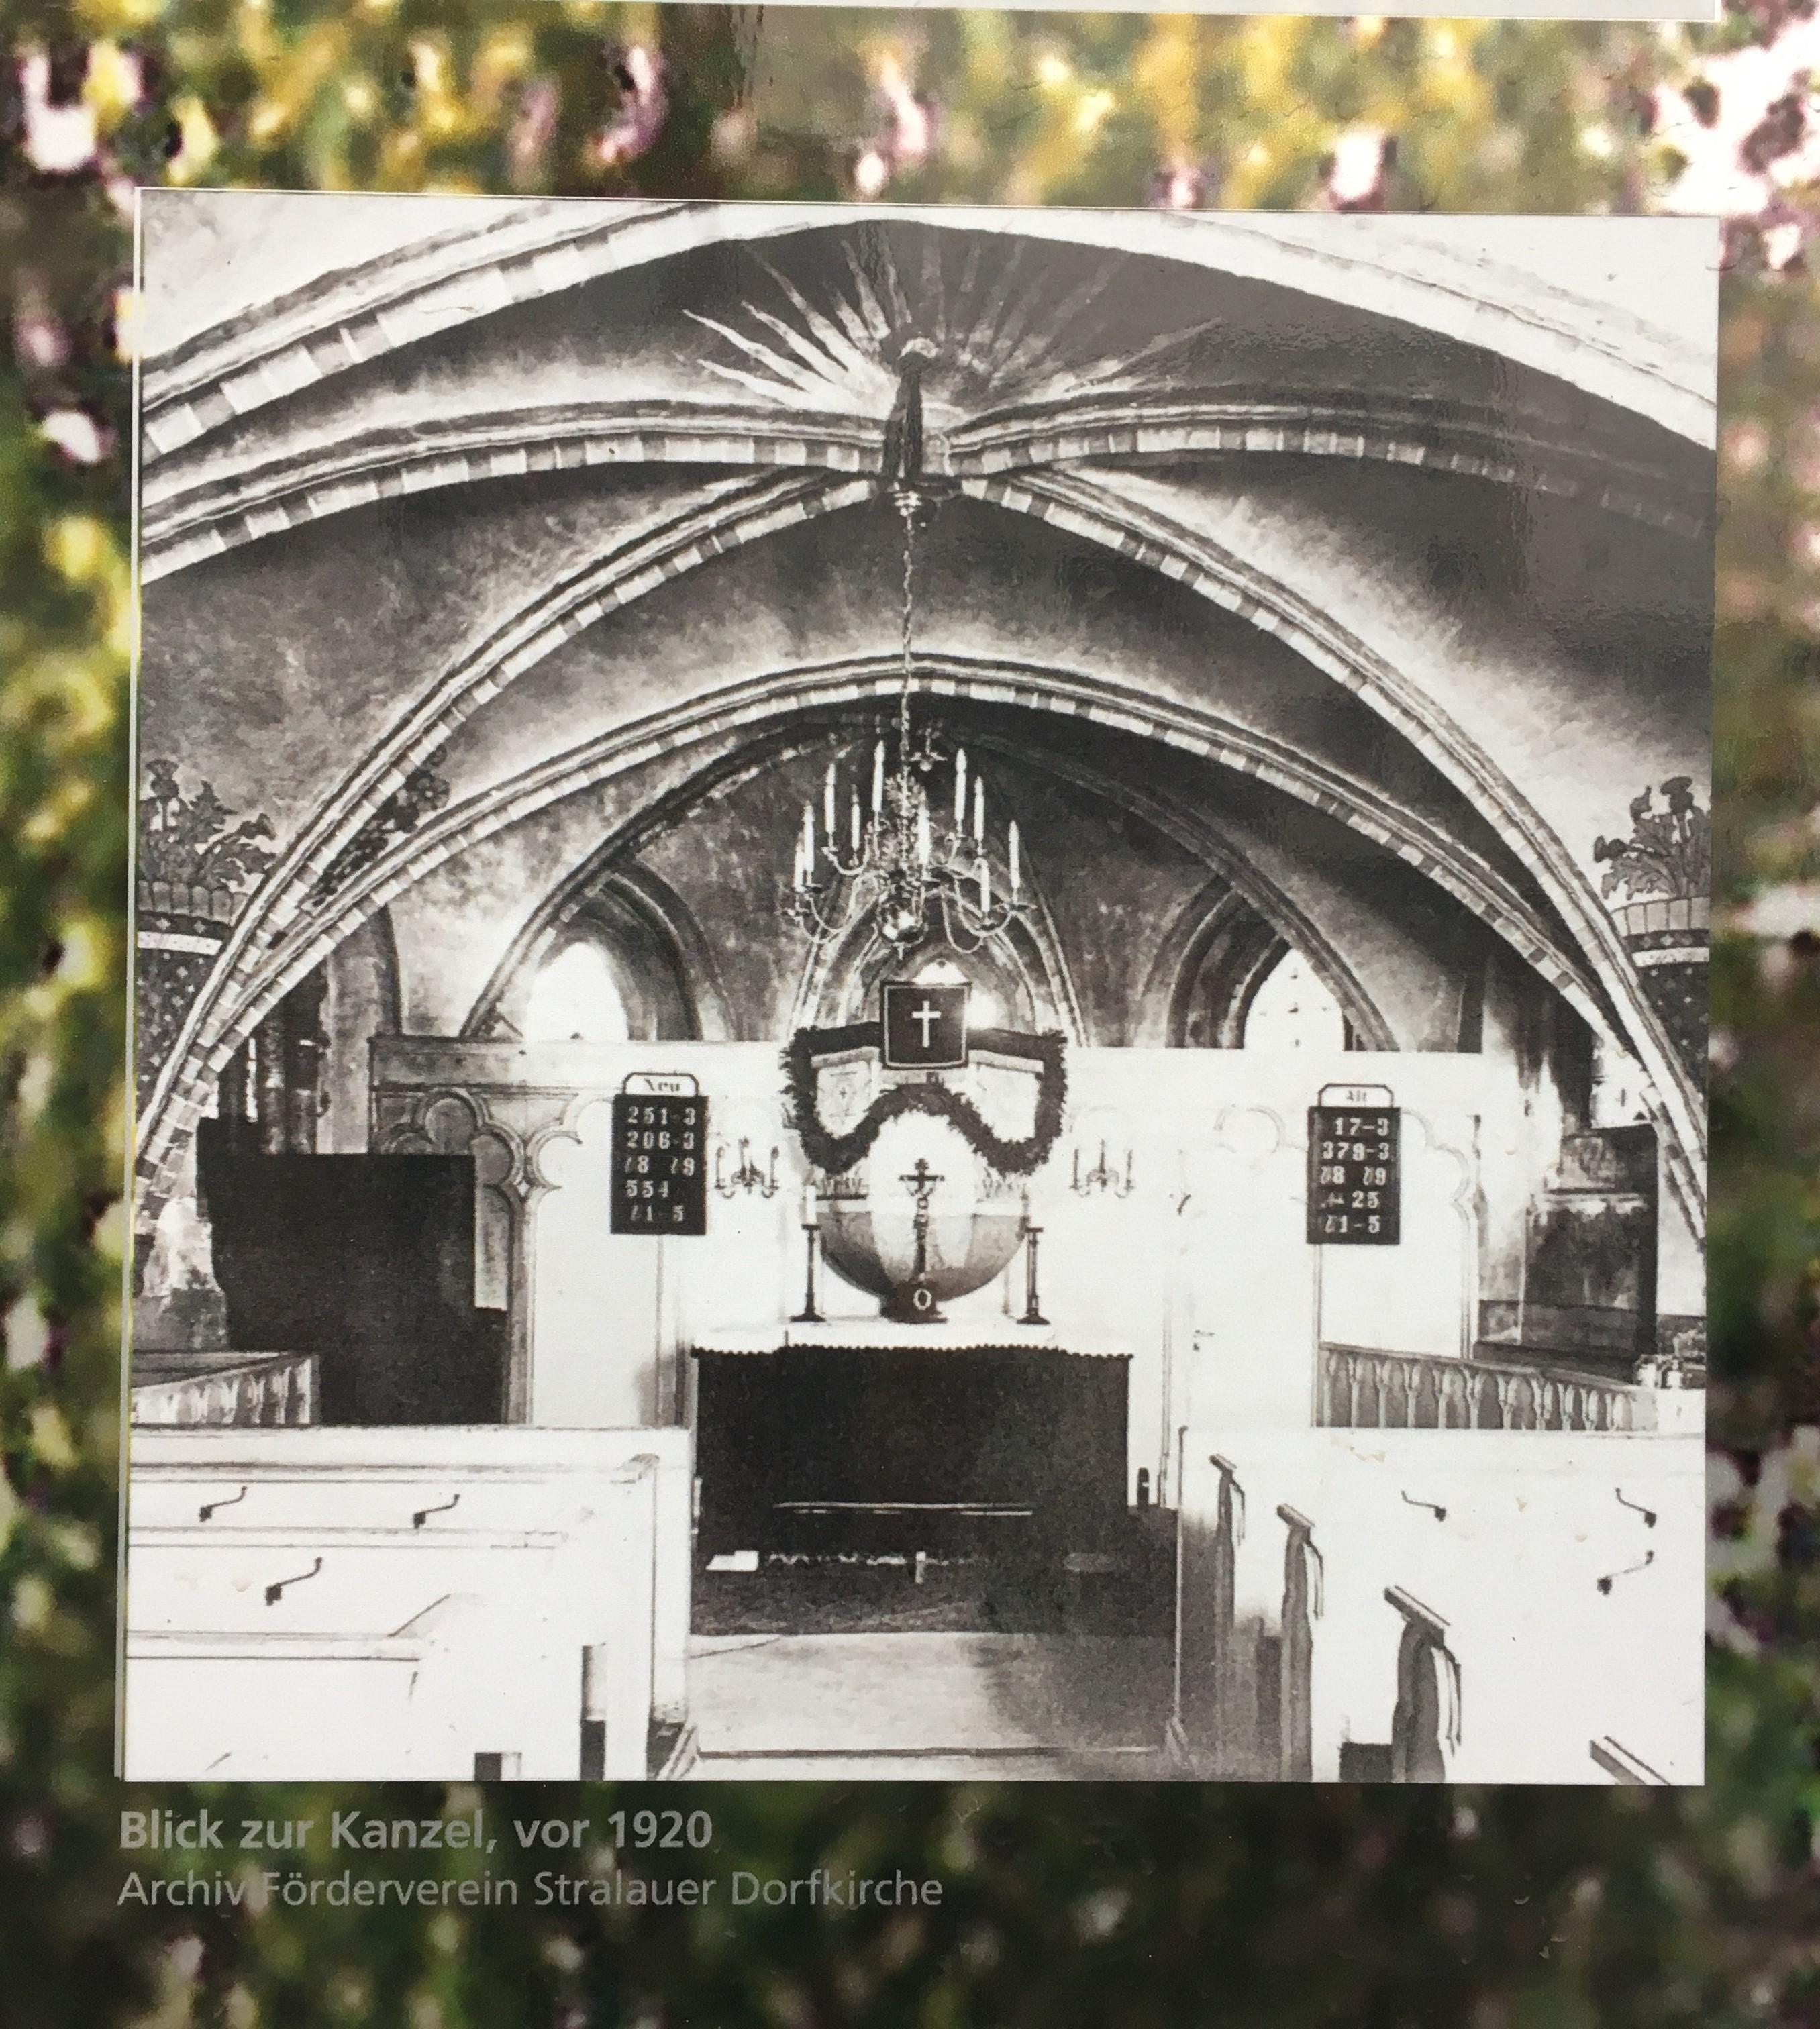 file berlin stralau dorfkirche innenraum vor 1920 fop germany jpg